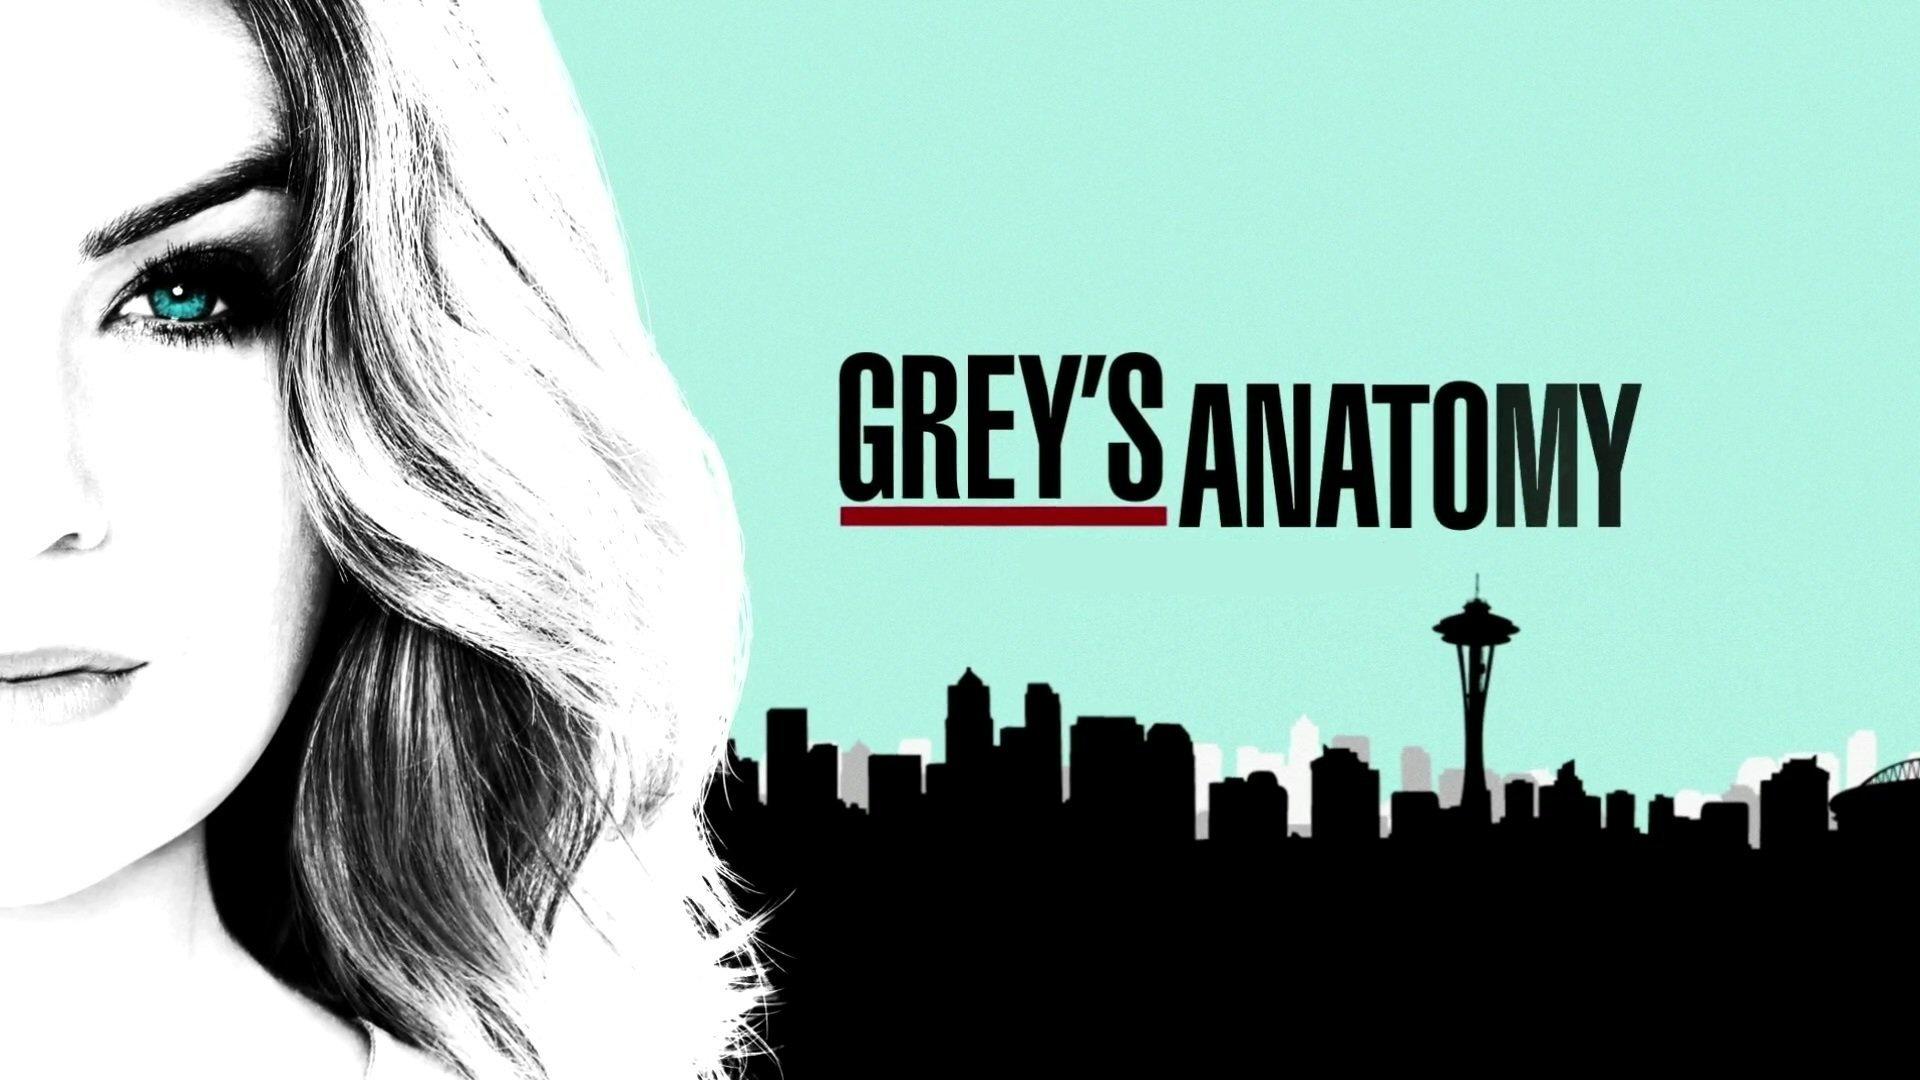 General 1920x1080 Ellen Pompeo Meredith Grey Grey's Anatomy